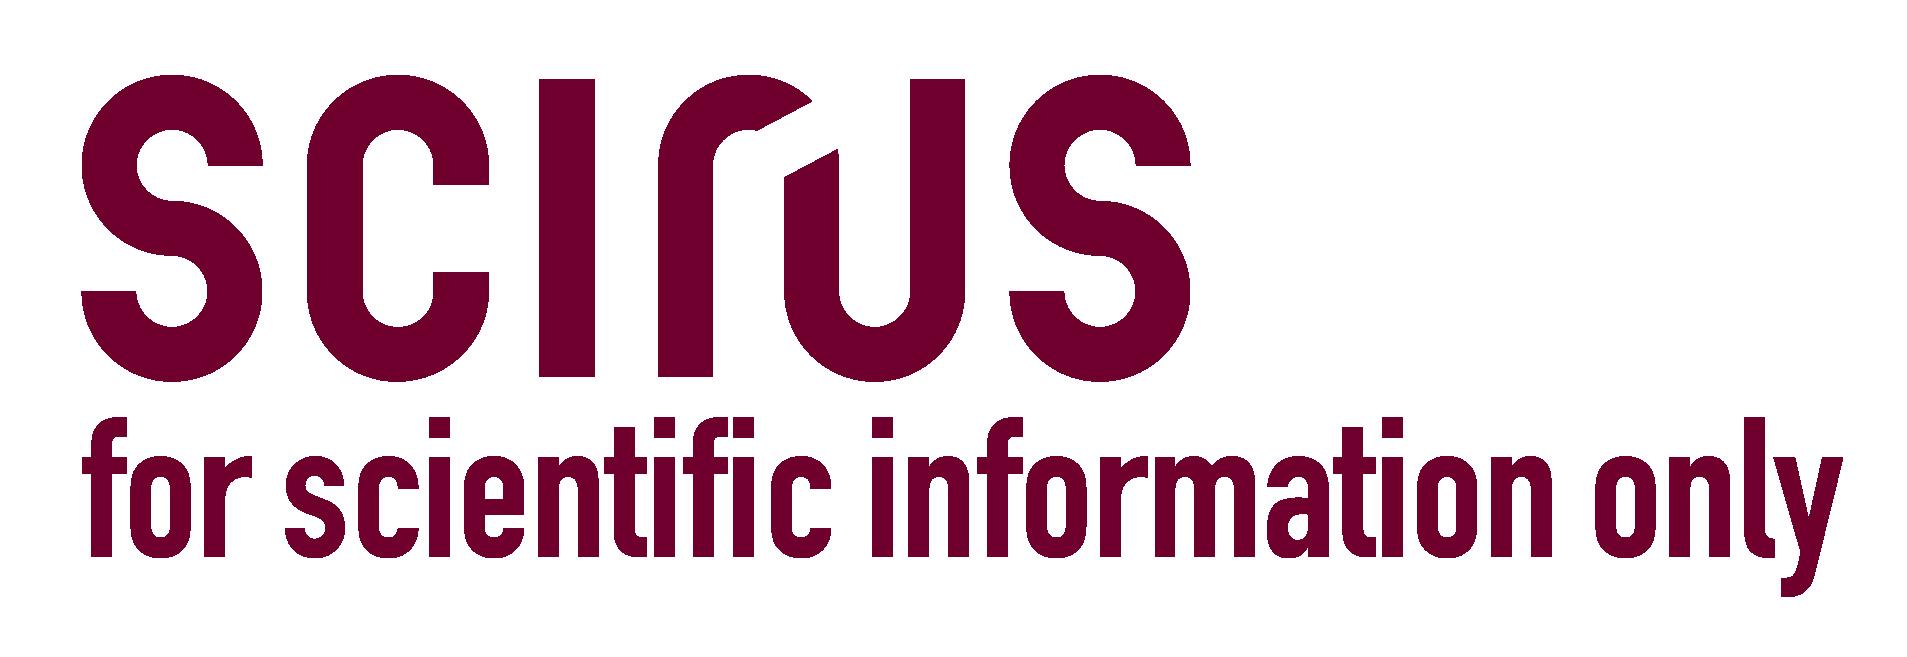 Scirus, the science-focused search engine image